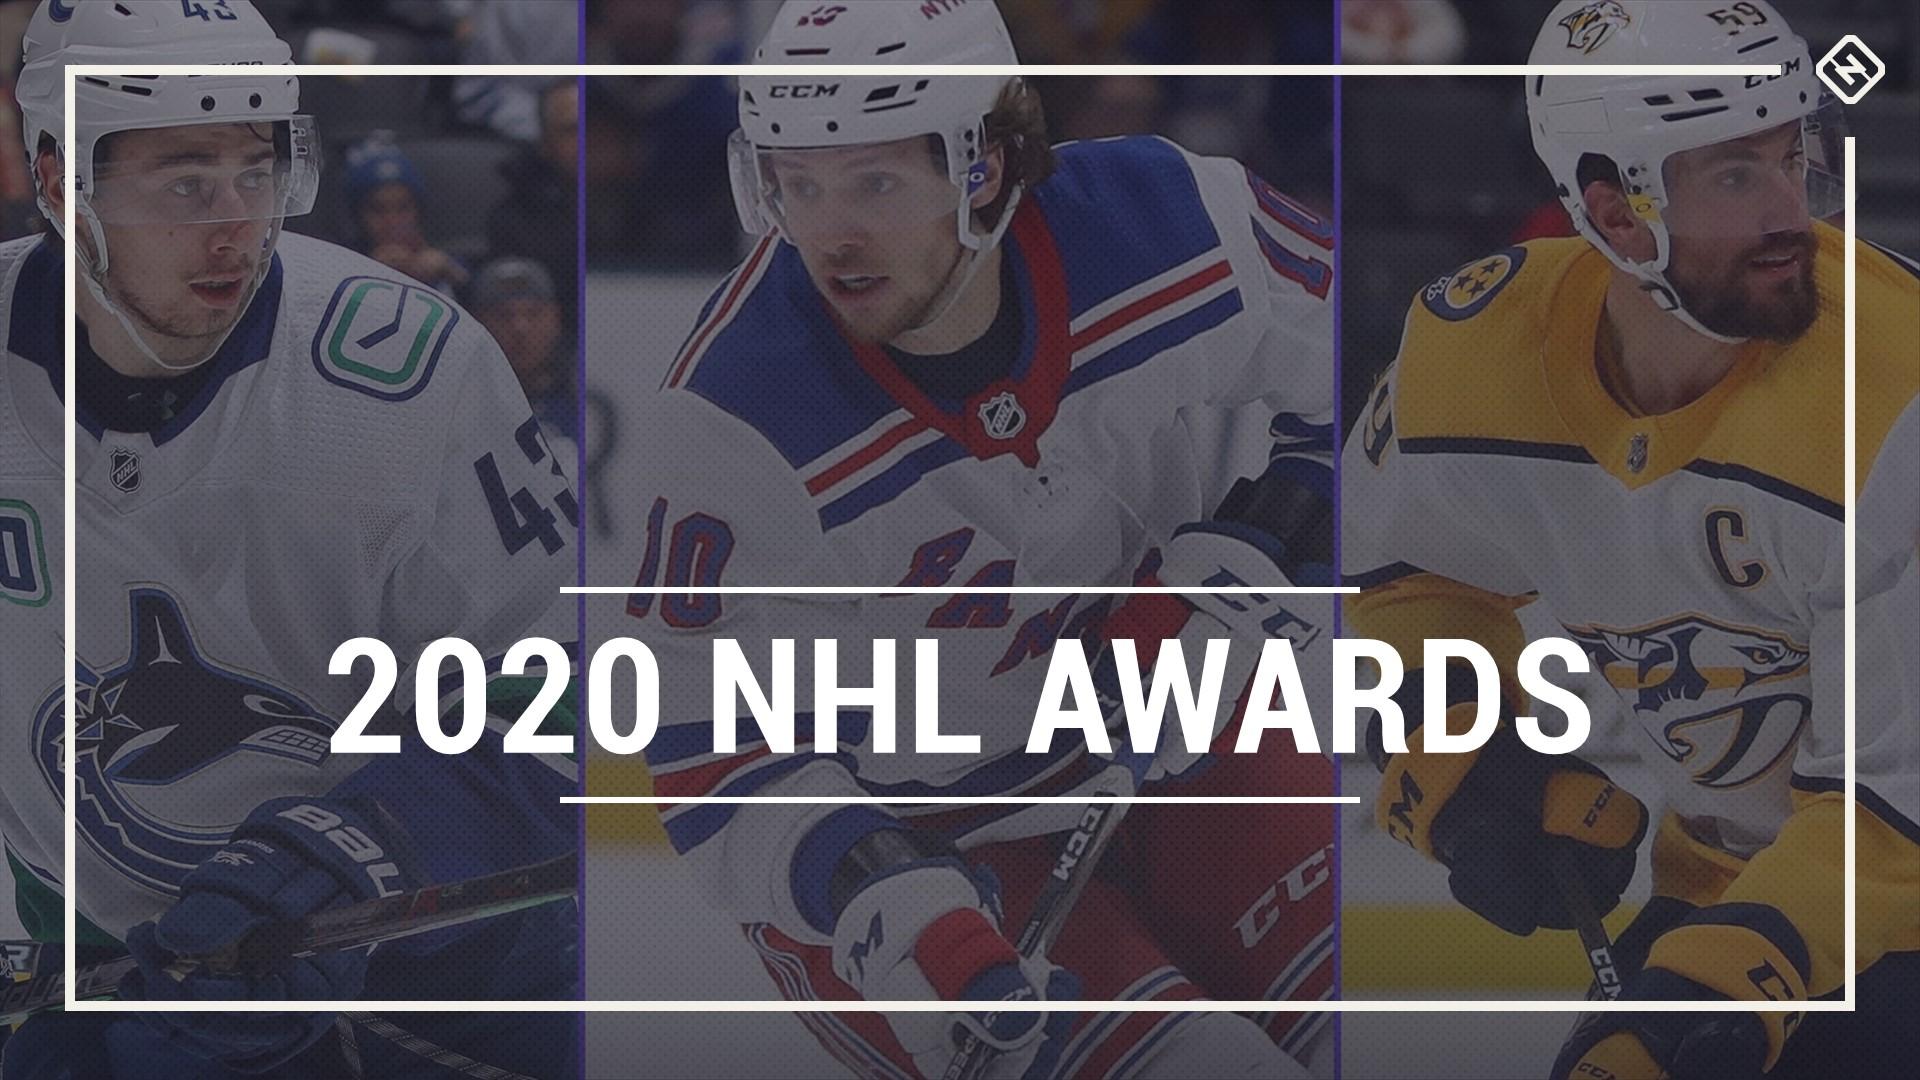 Nhl-awards-090720-getty-ftrjpeg_18k6pwof995j5194zpoxahaw2t